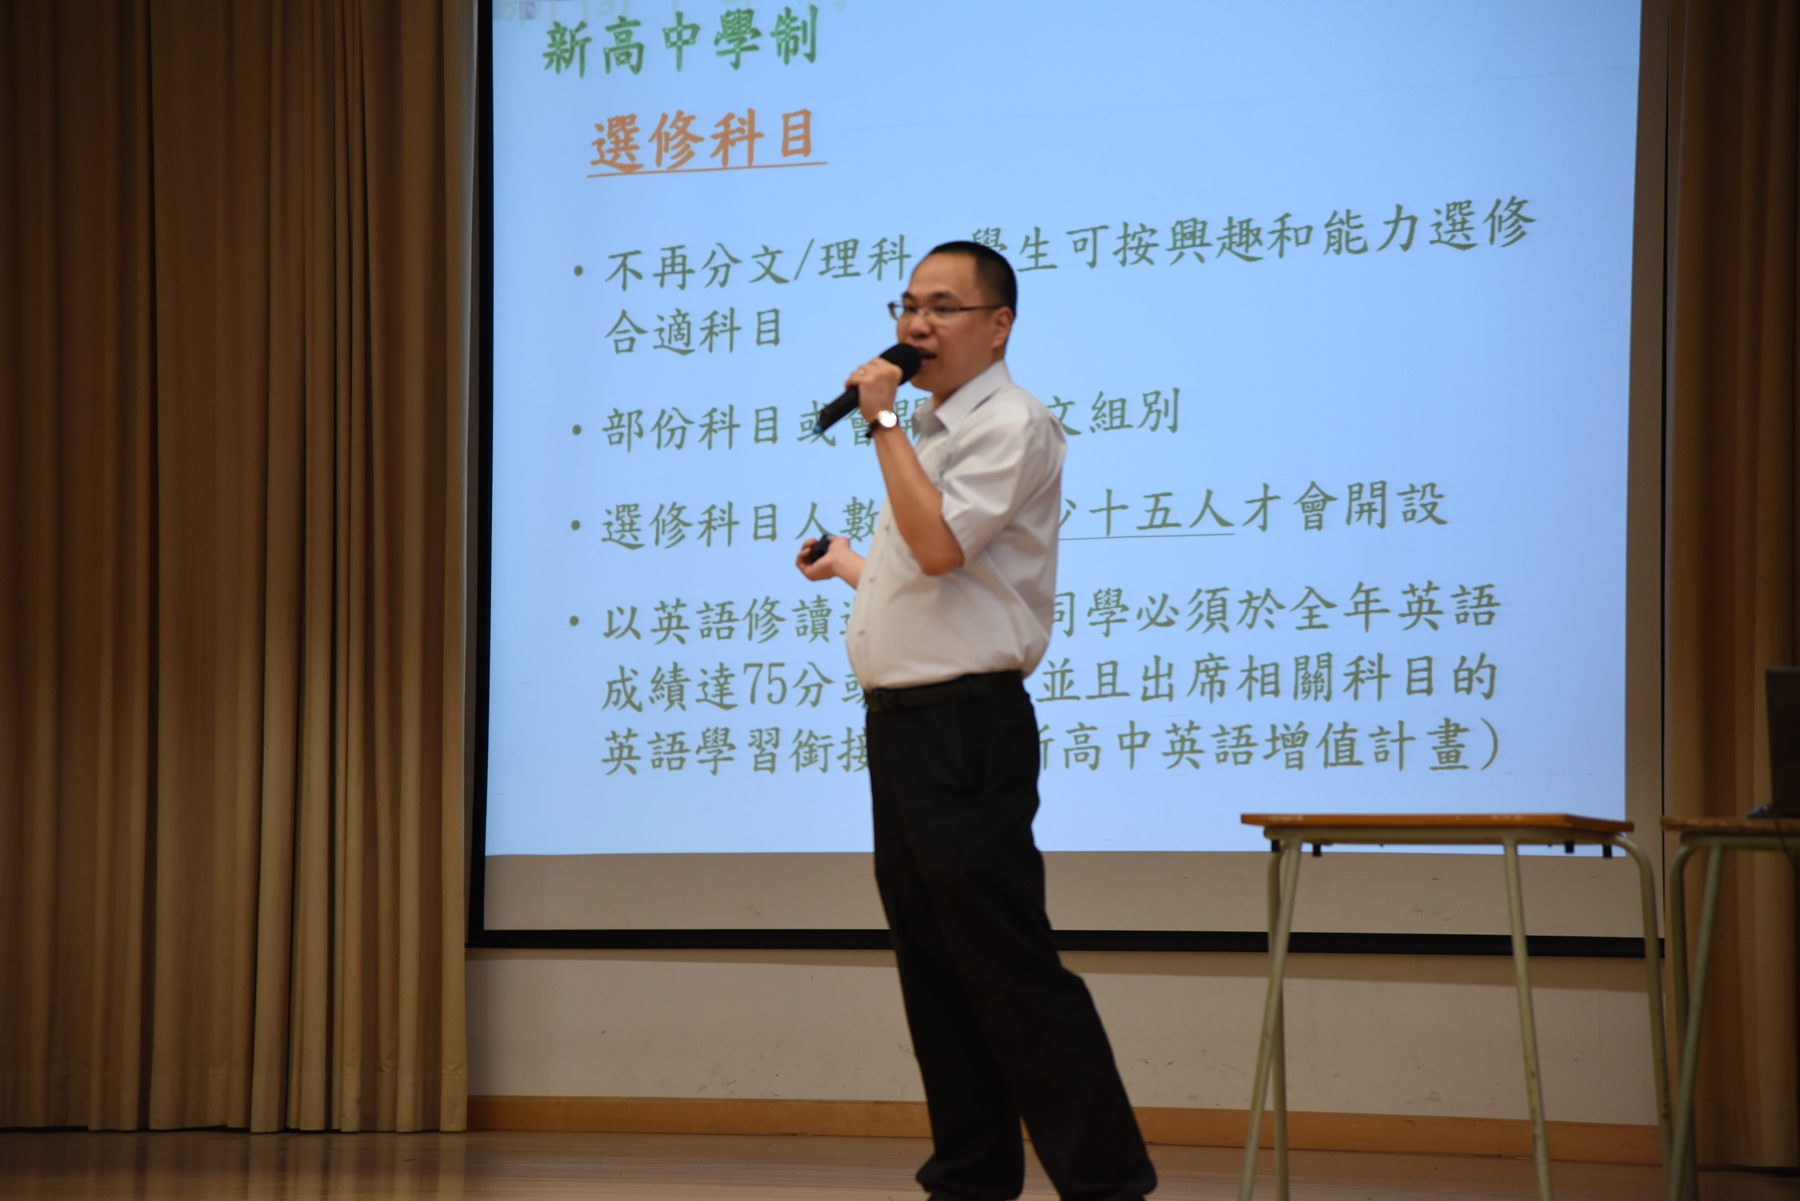 http://www.npc.edu.hk/sites/default/files/dsc_1370.jpg